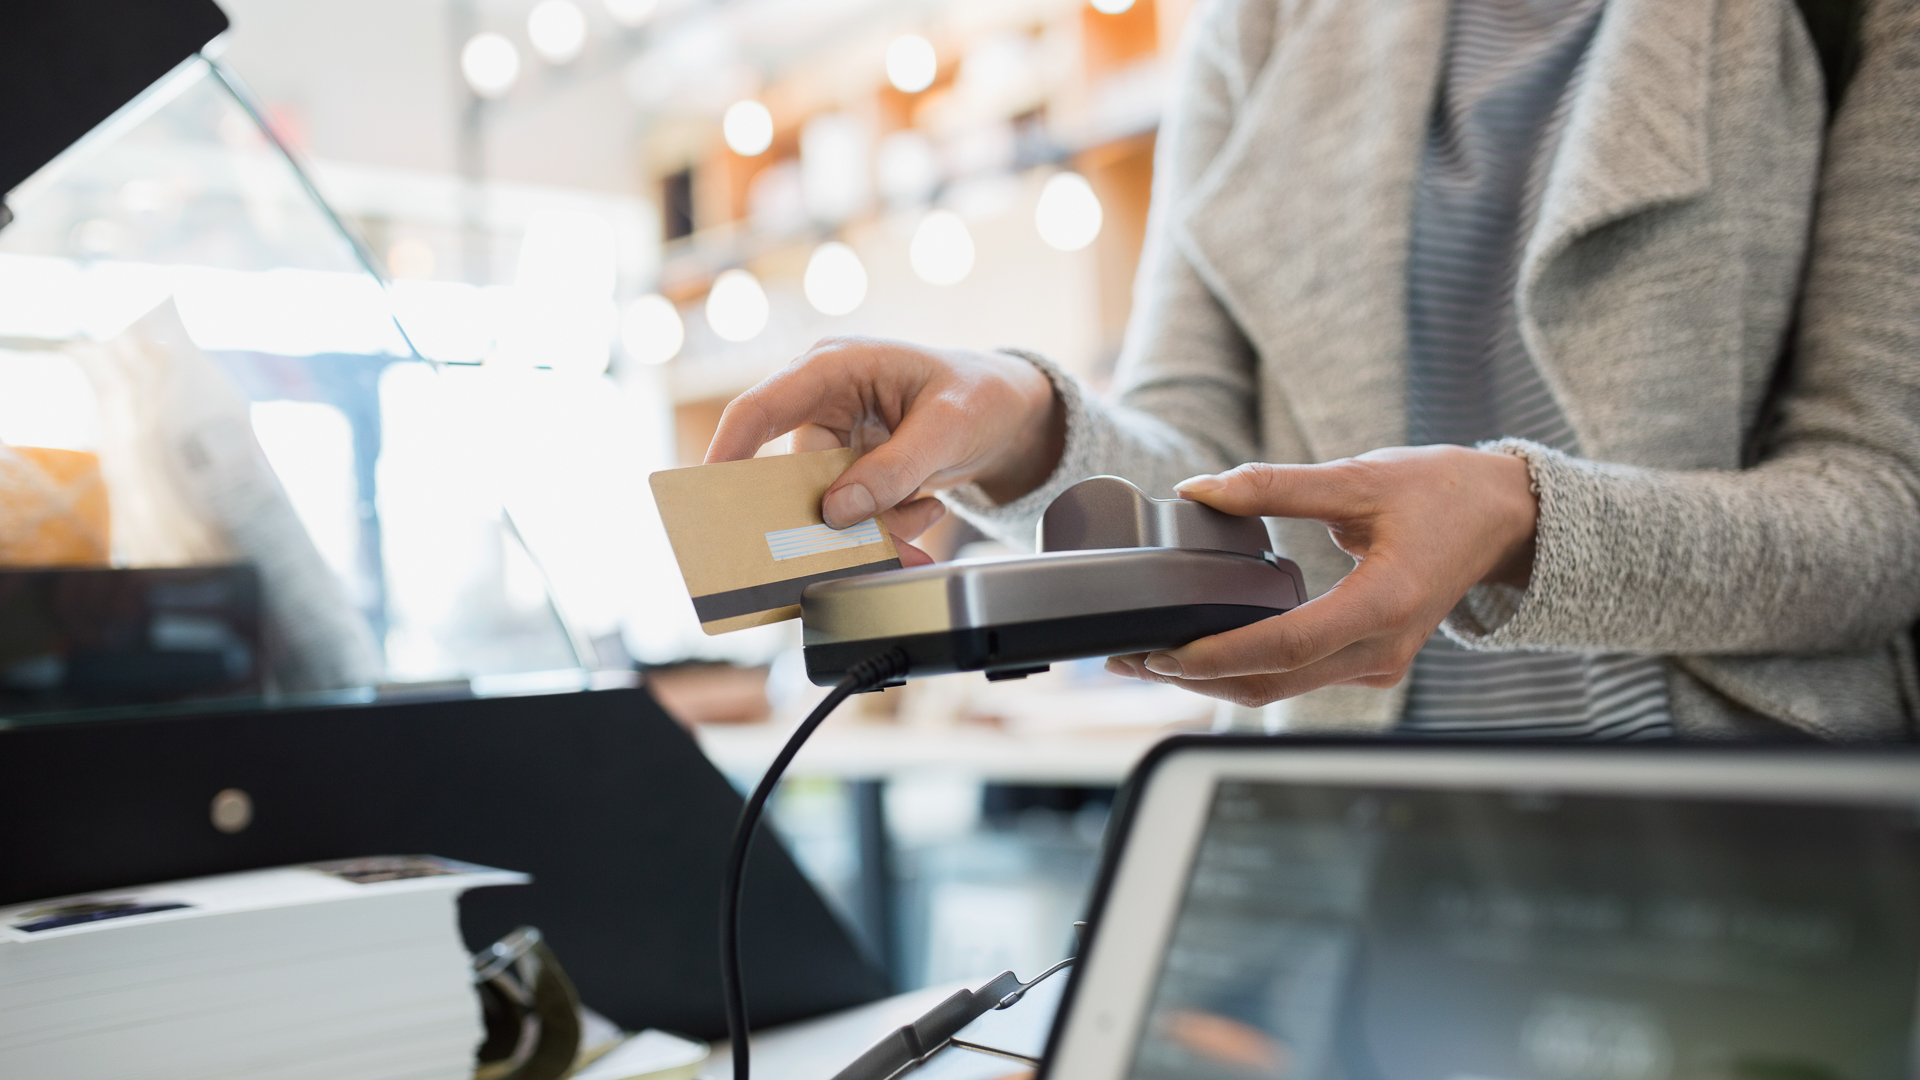 advantages of the costco credit card